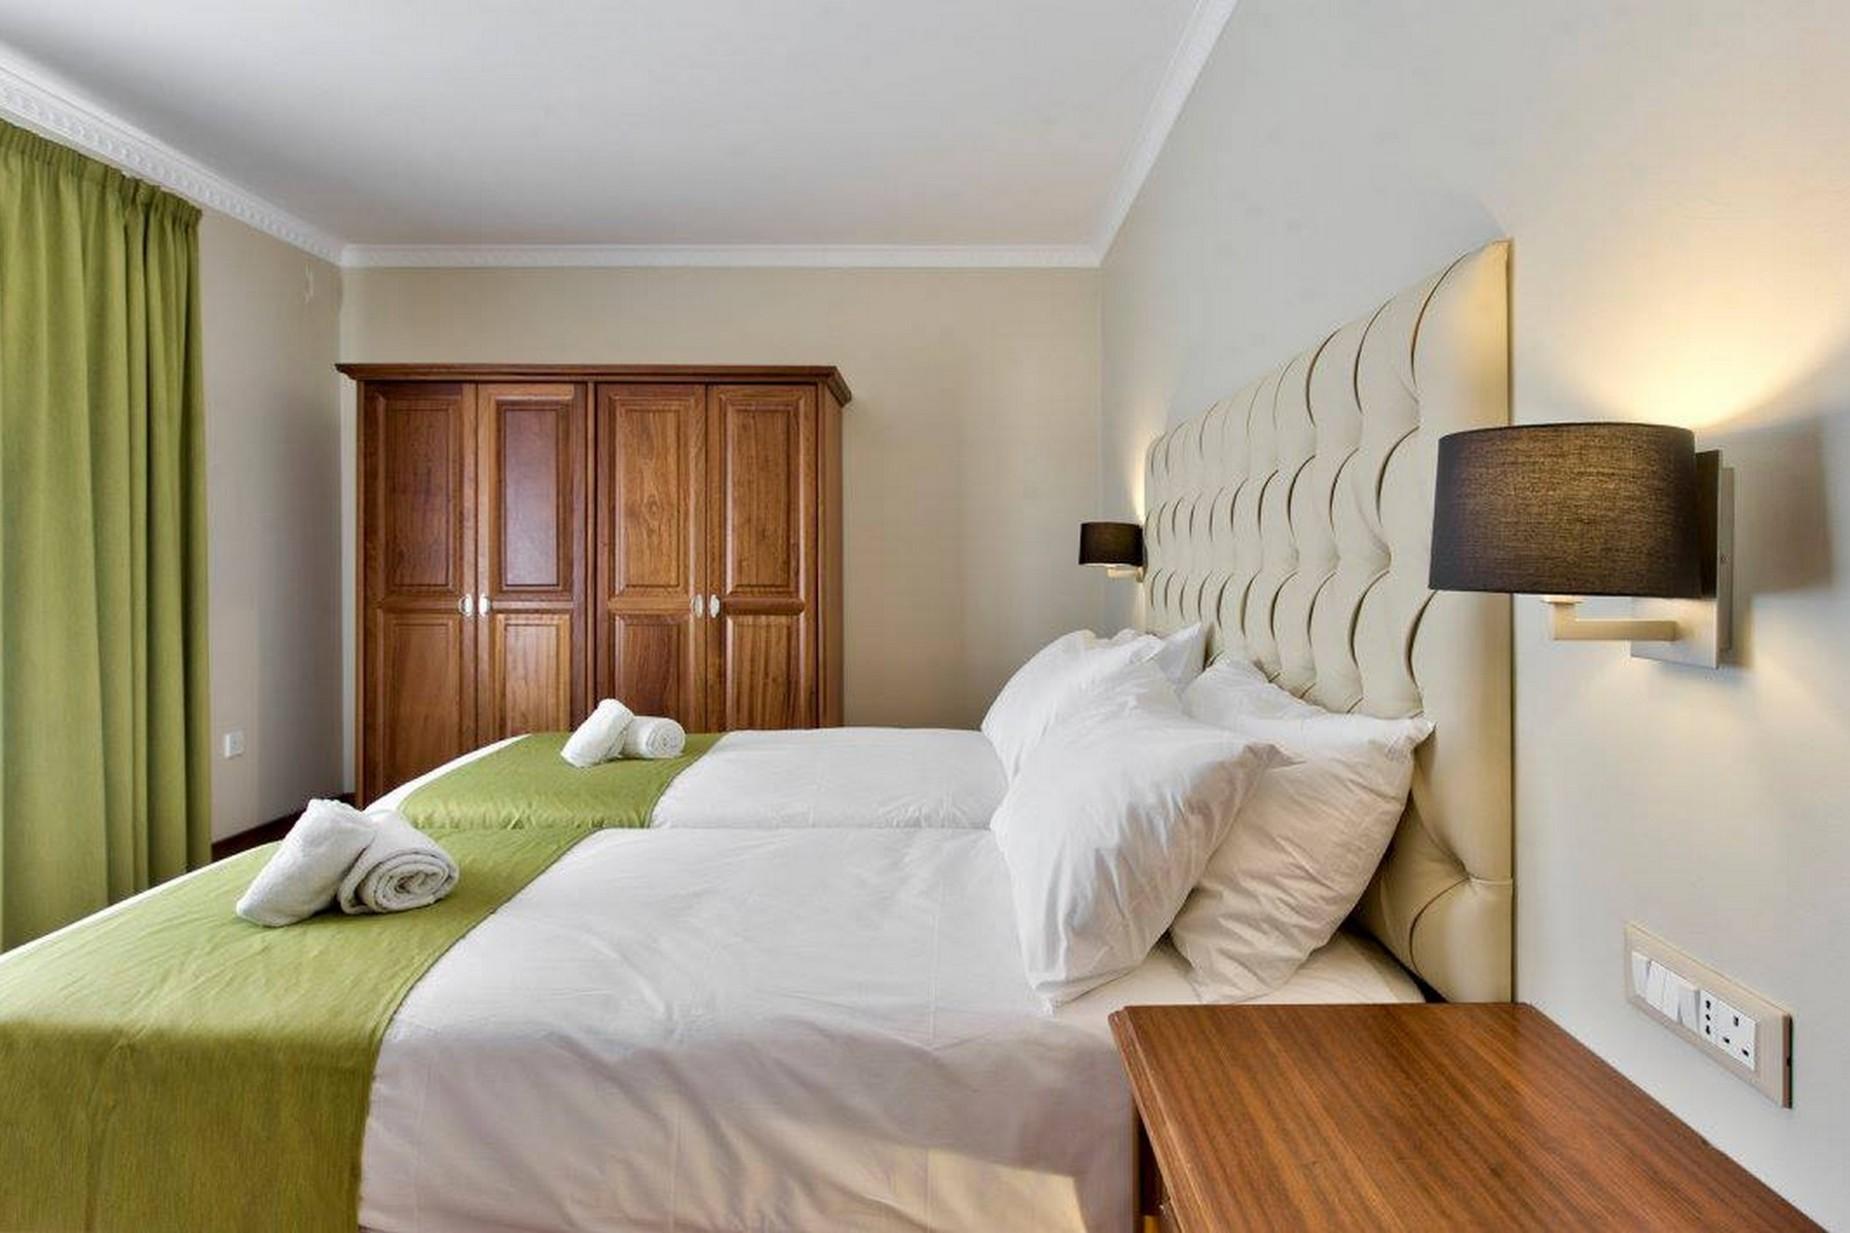 3 bed Villa For Rent in Mellieha, Mellieha - thumb 14